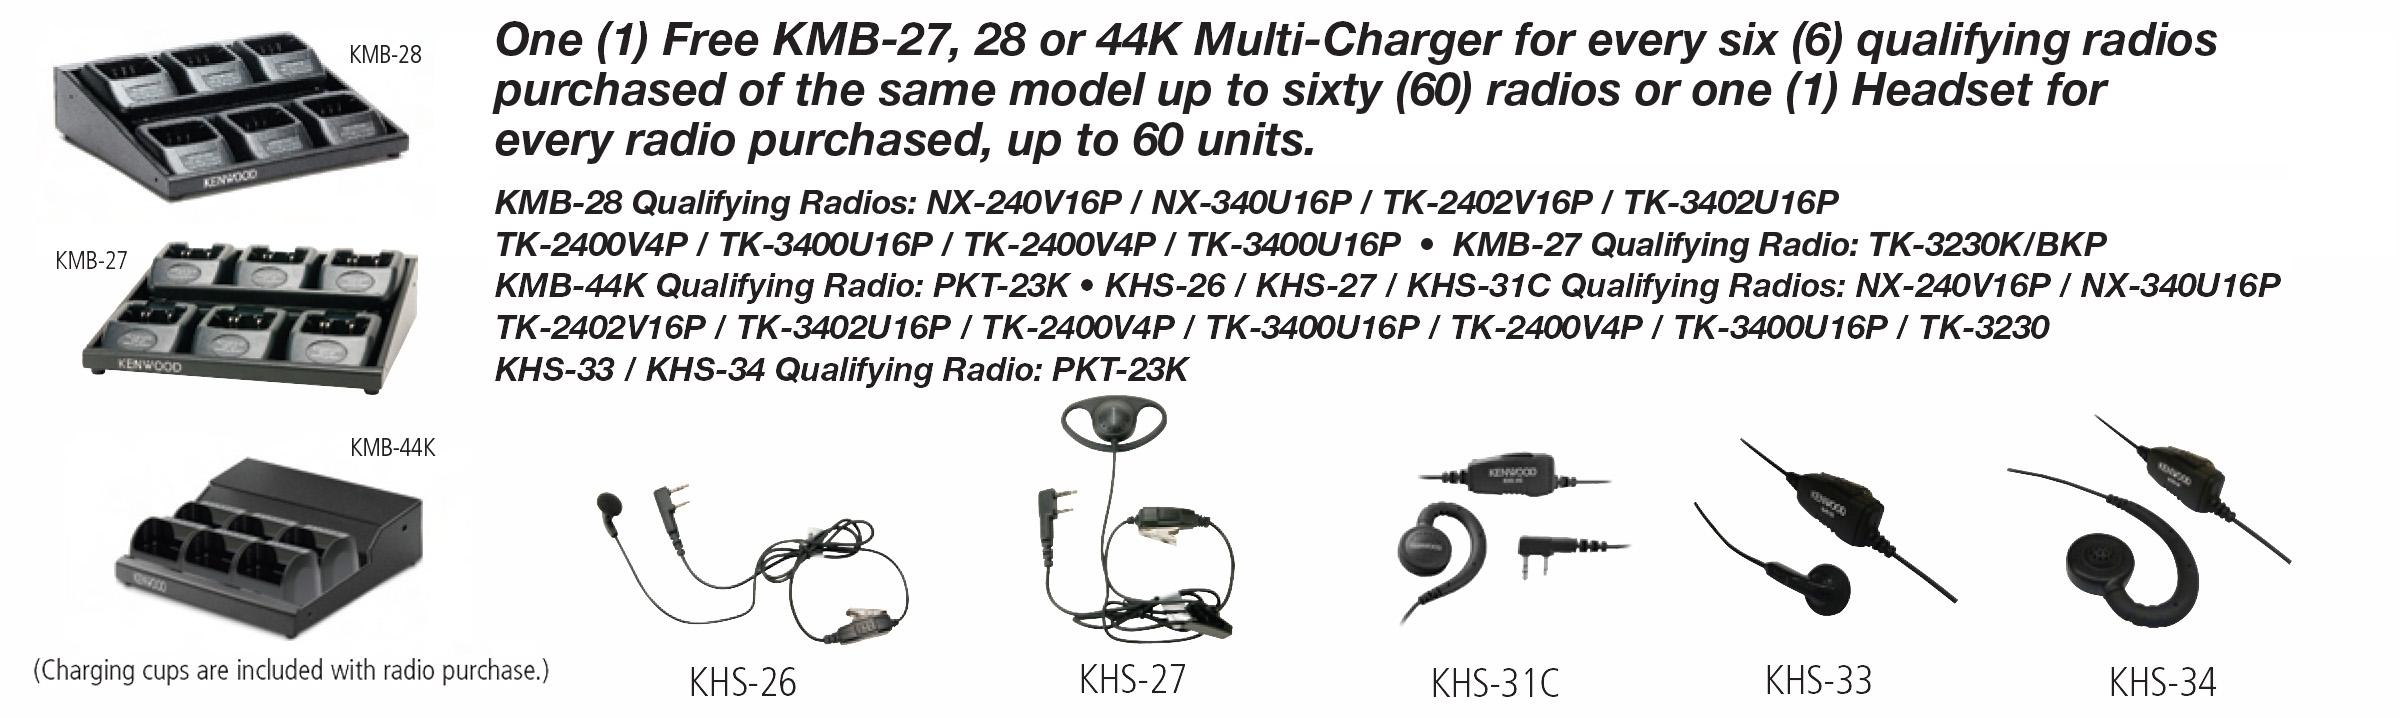 Kenwood Rebate Charger Earpiece Options